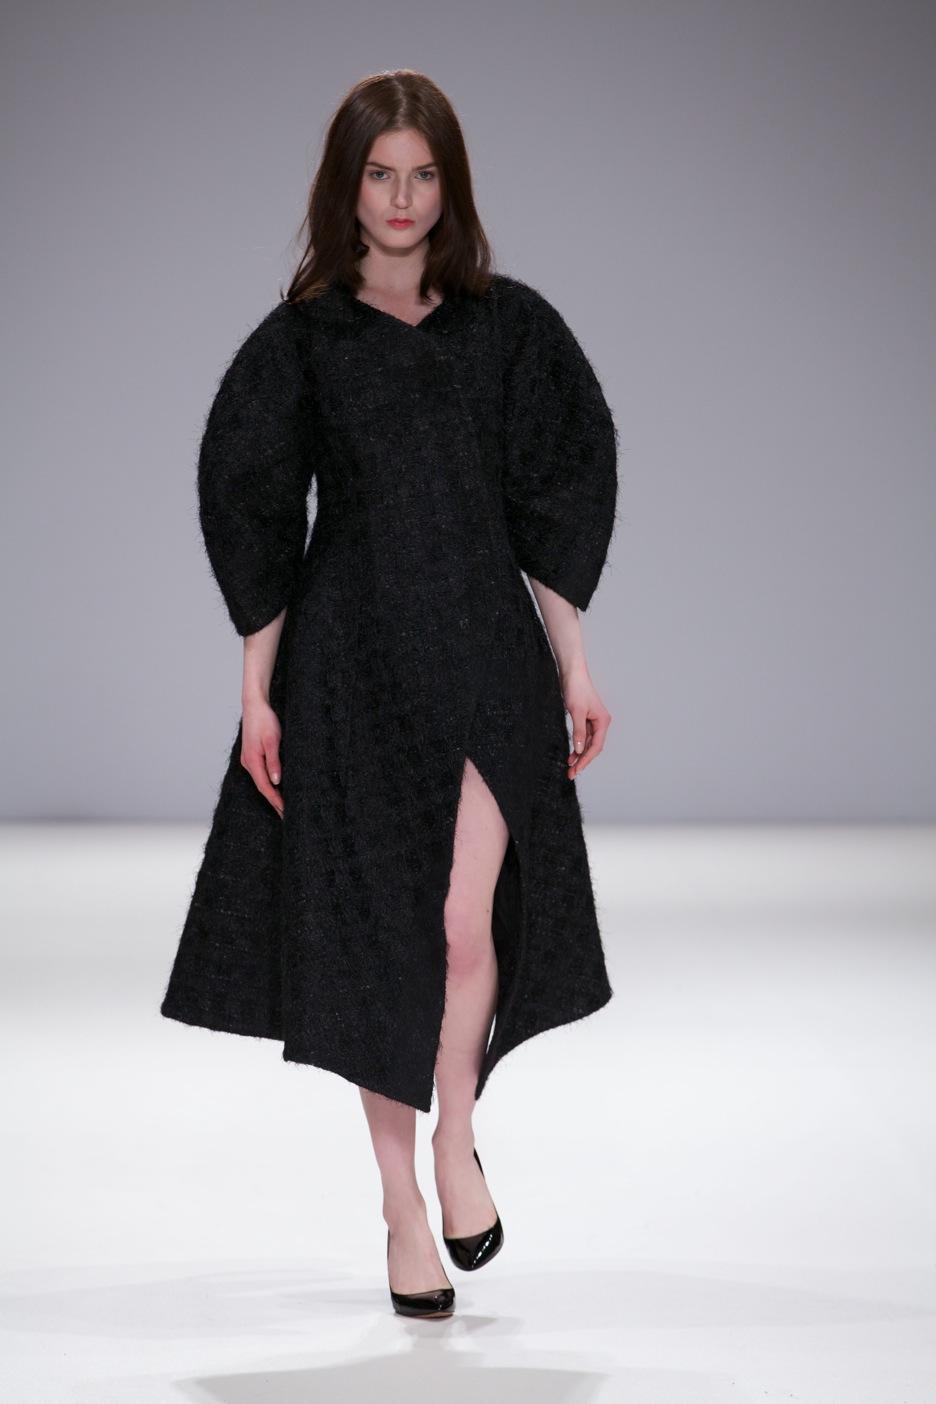 Kiev Fashion Days A-W 2014 (c) Marc aitken 2014  20.jpg